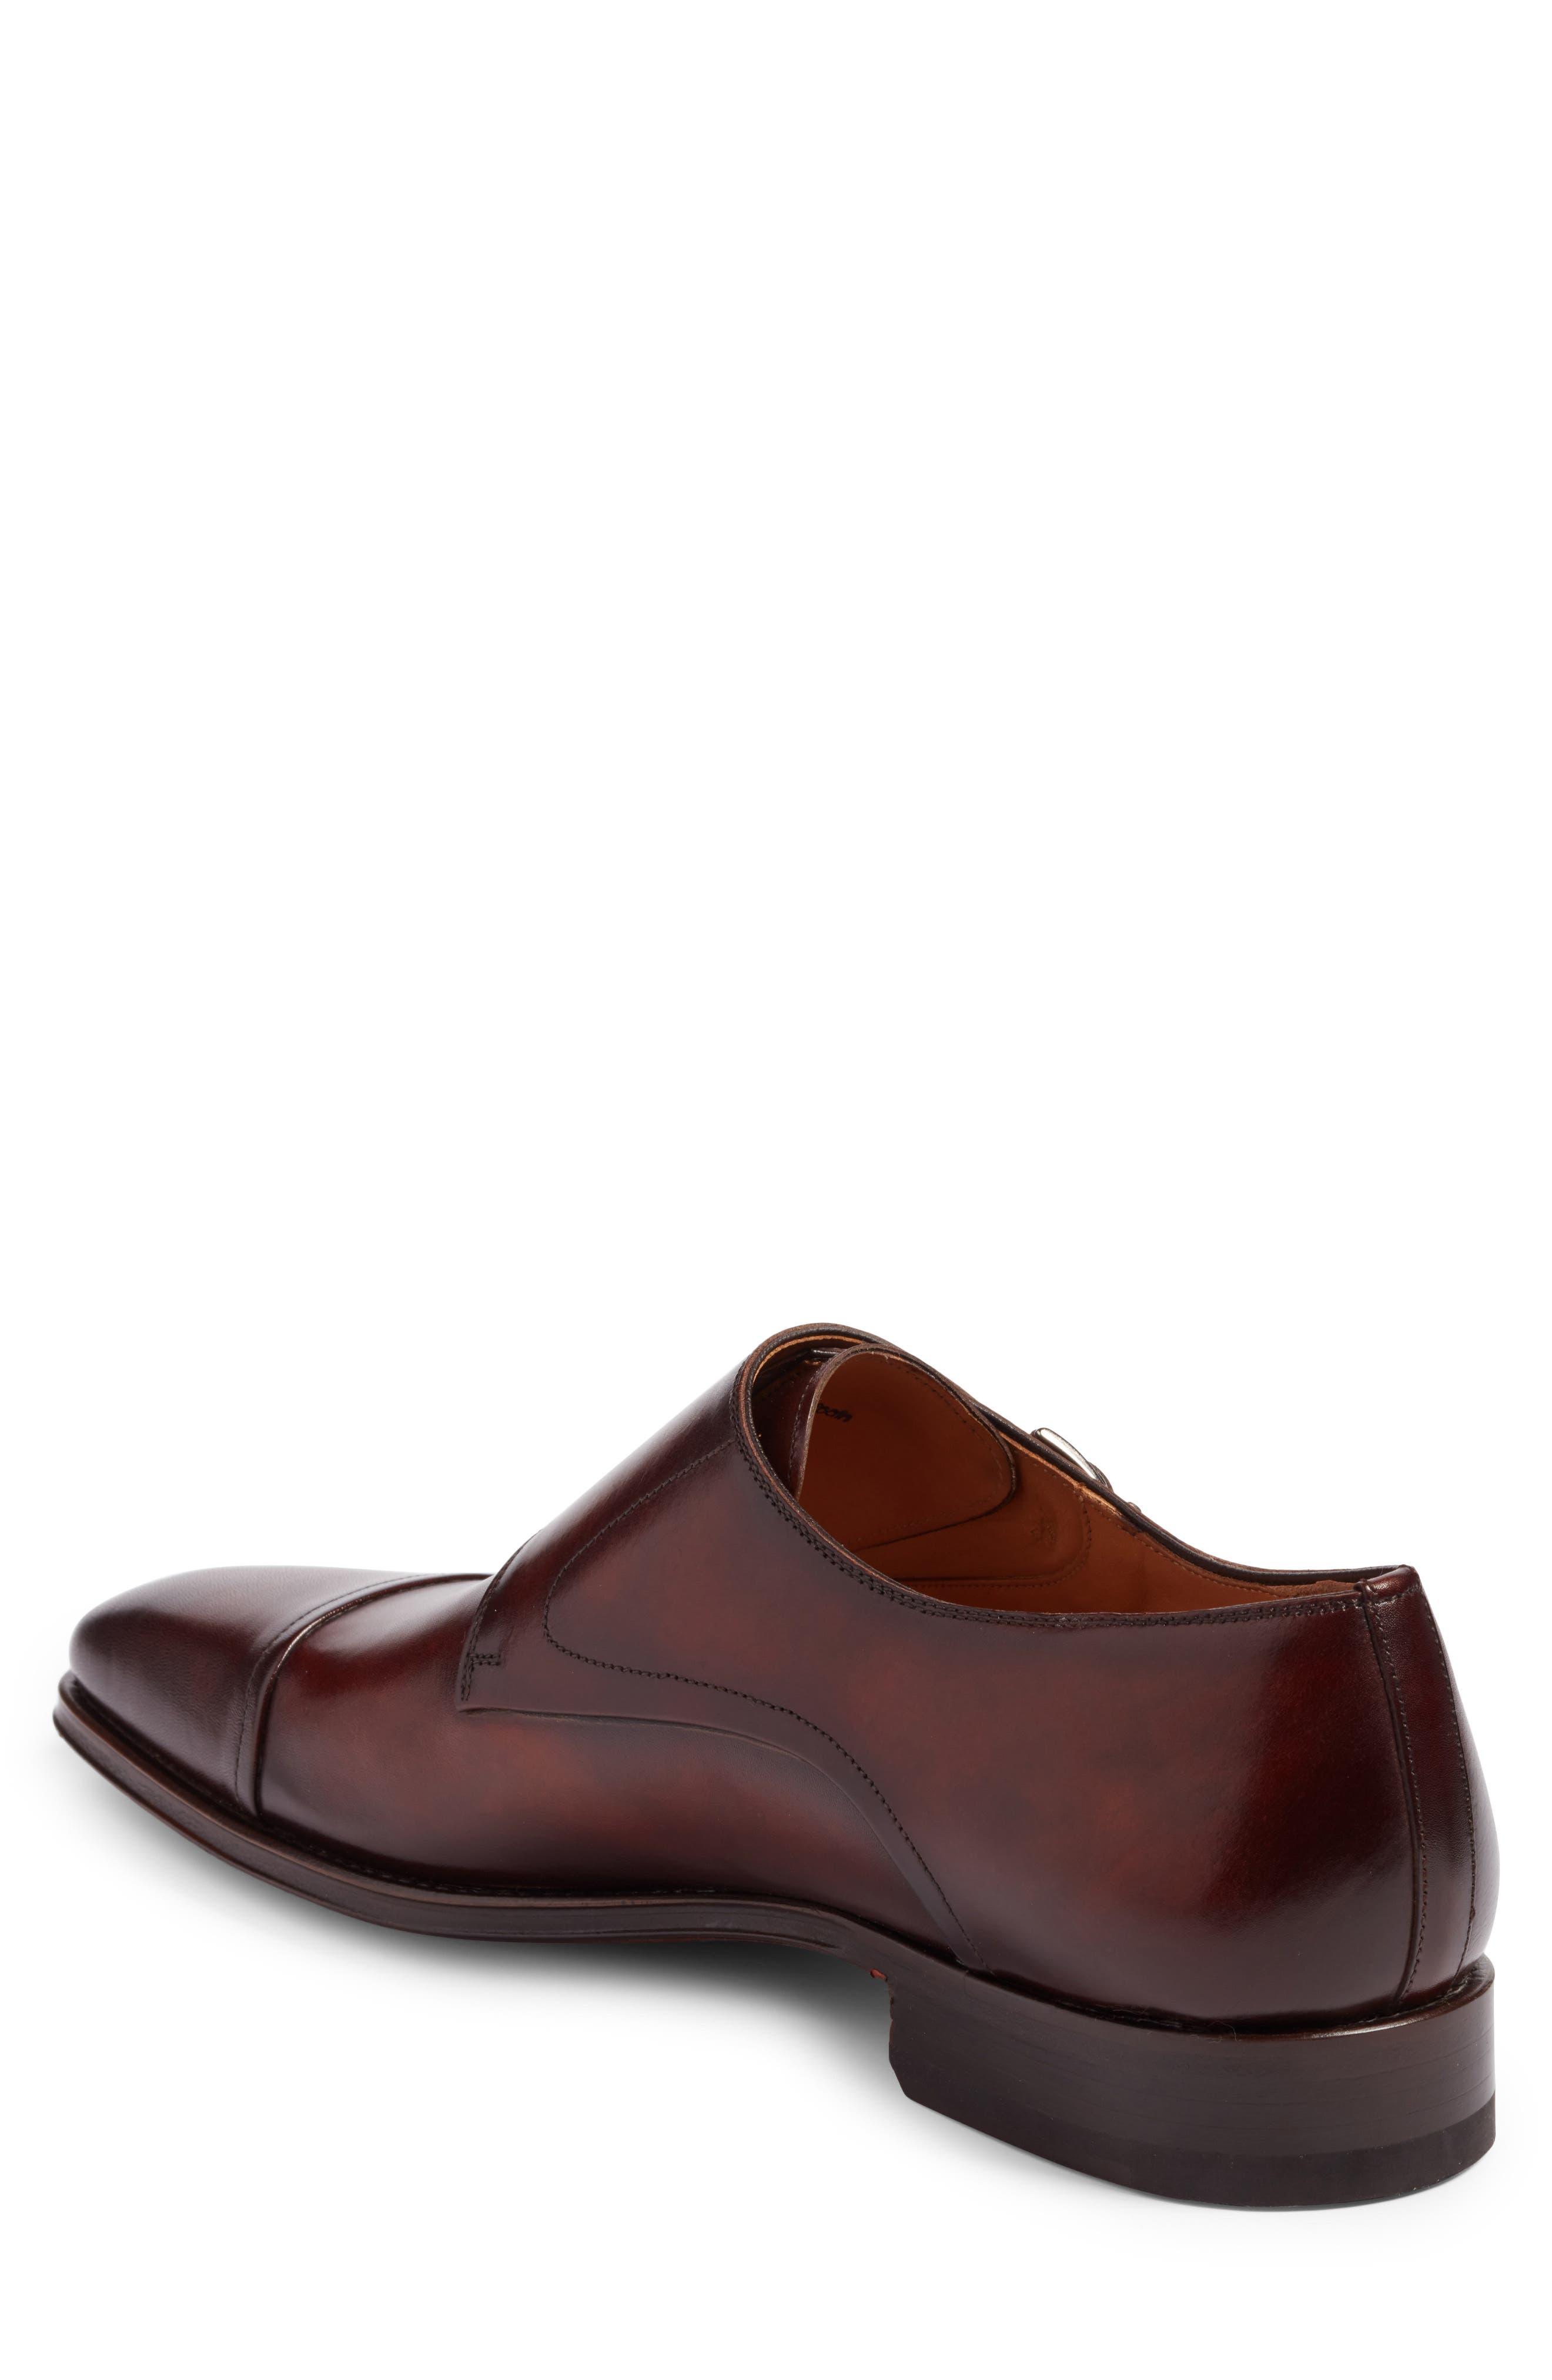 Alternate Image 2  - Magnanni Silvio Double Monk Strap Shoe (Men)